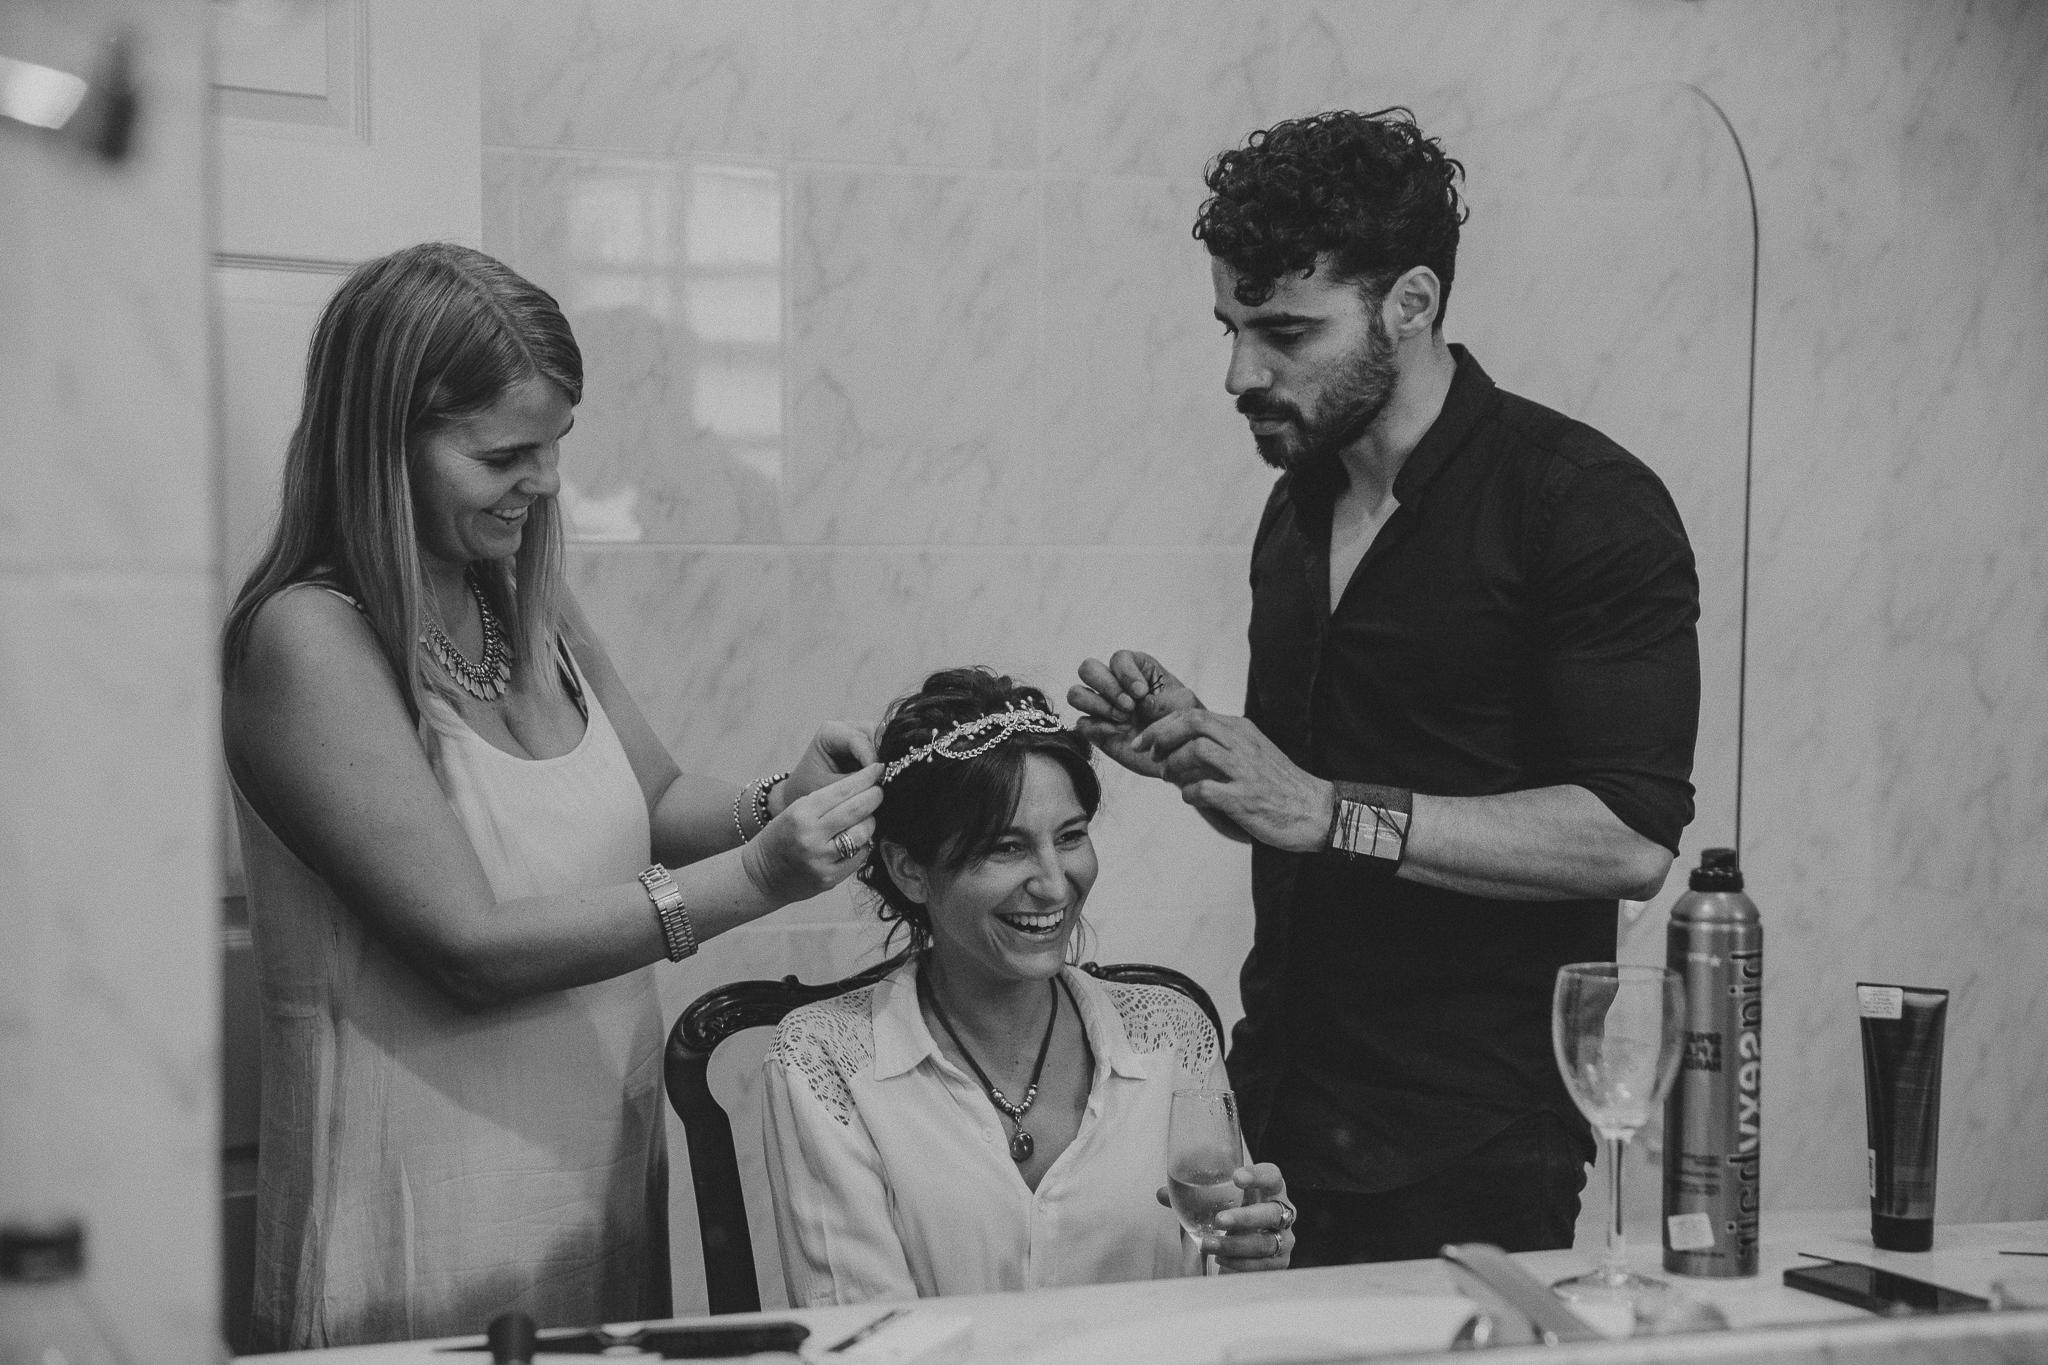 preparativos de novia - fotografo uruguay